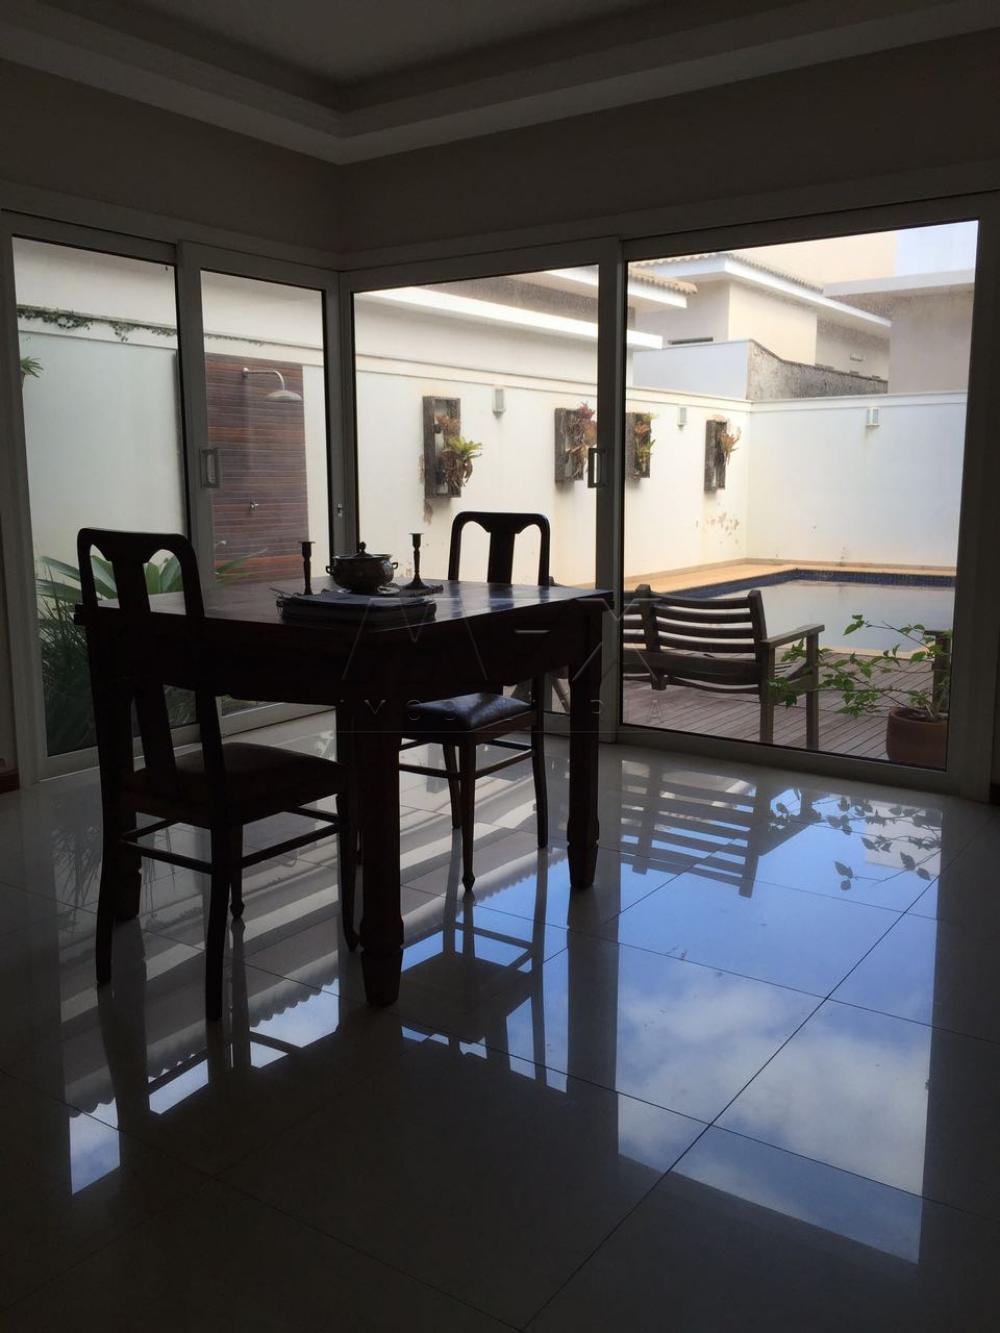 Alugar Casa / Condomínio em Bauru R$ 7.000,00 - Foto 2